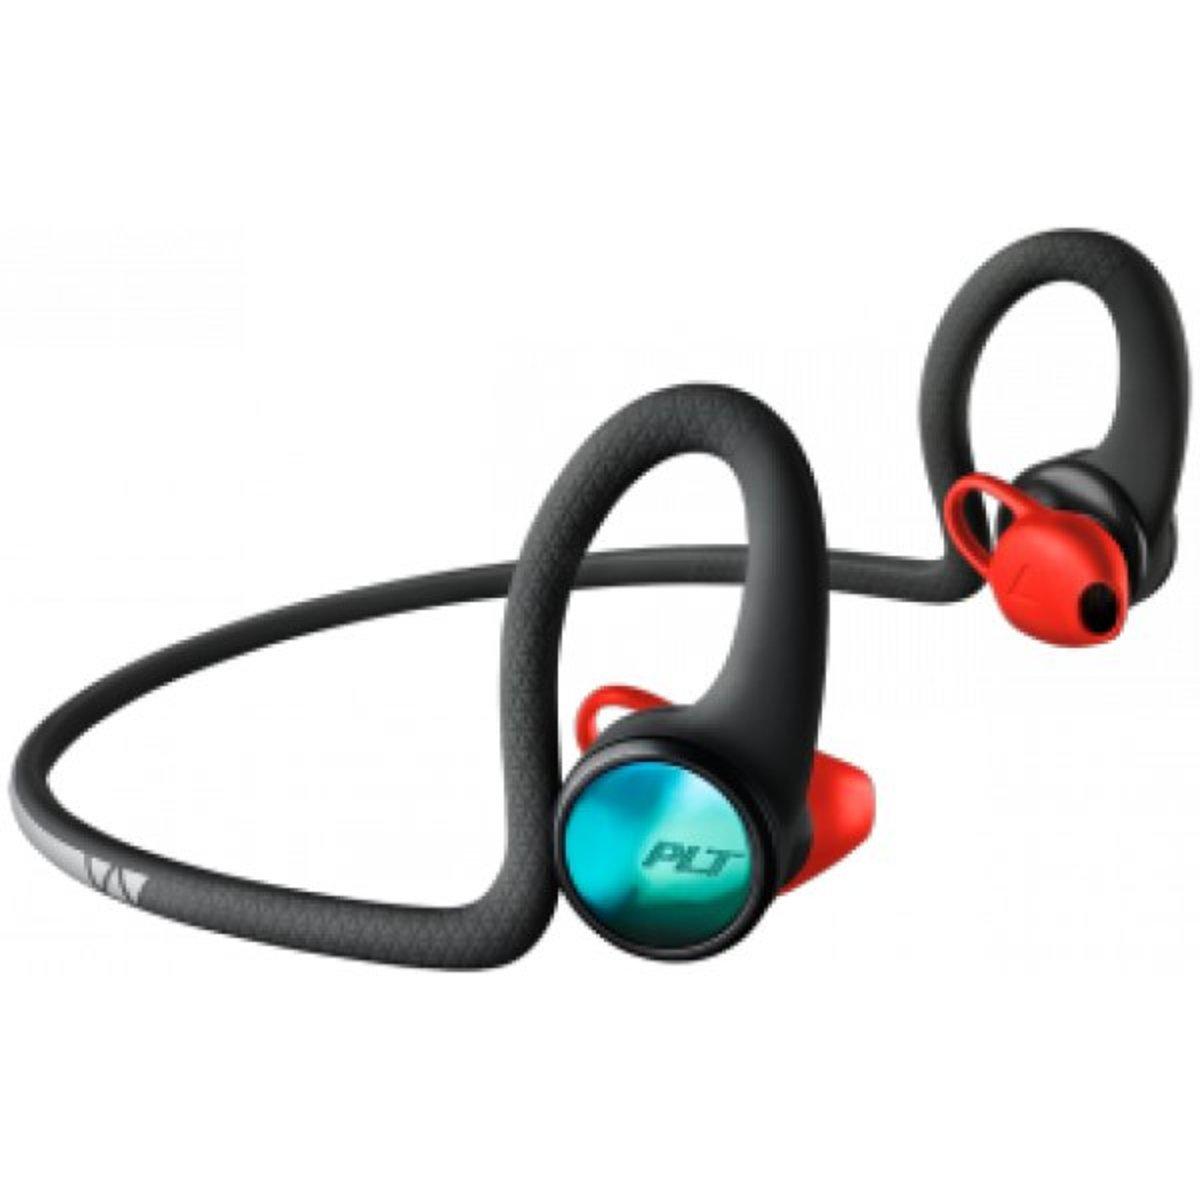 BACKBEAT FIT 2100 運動藍芽耳機, 黑色 - 香港行貨